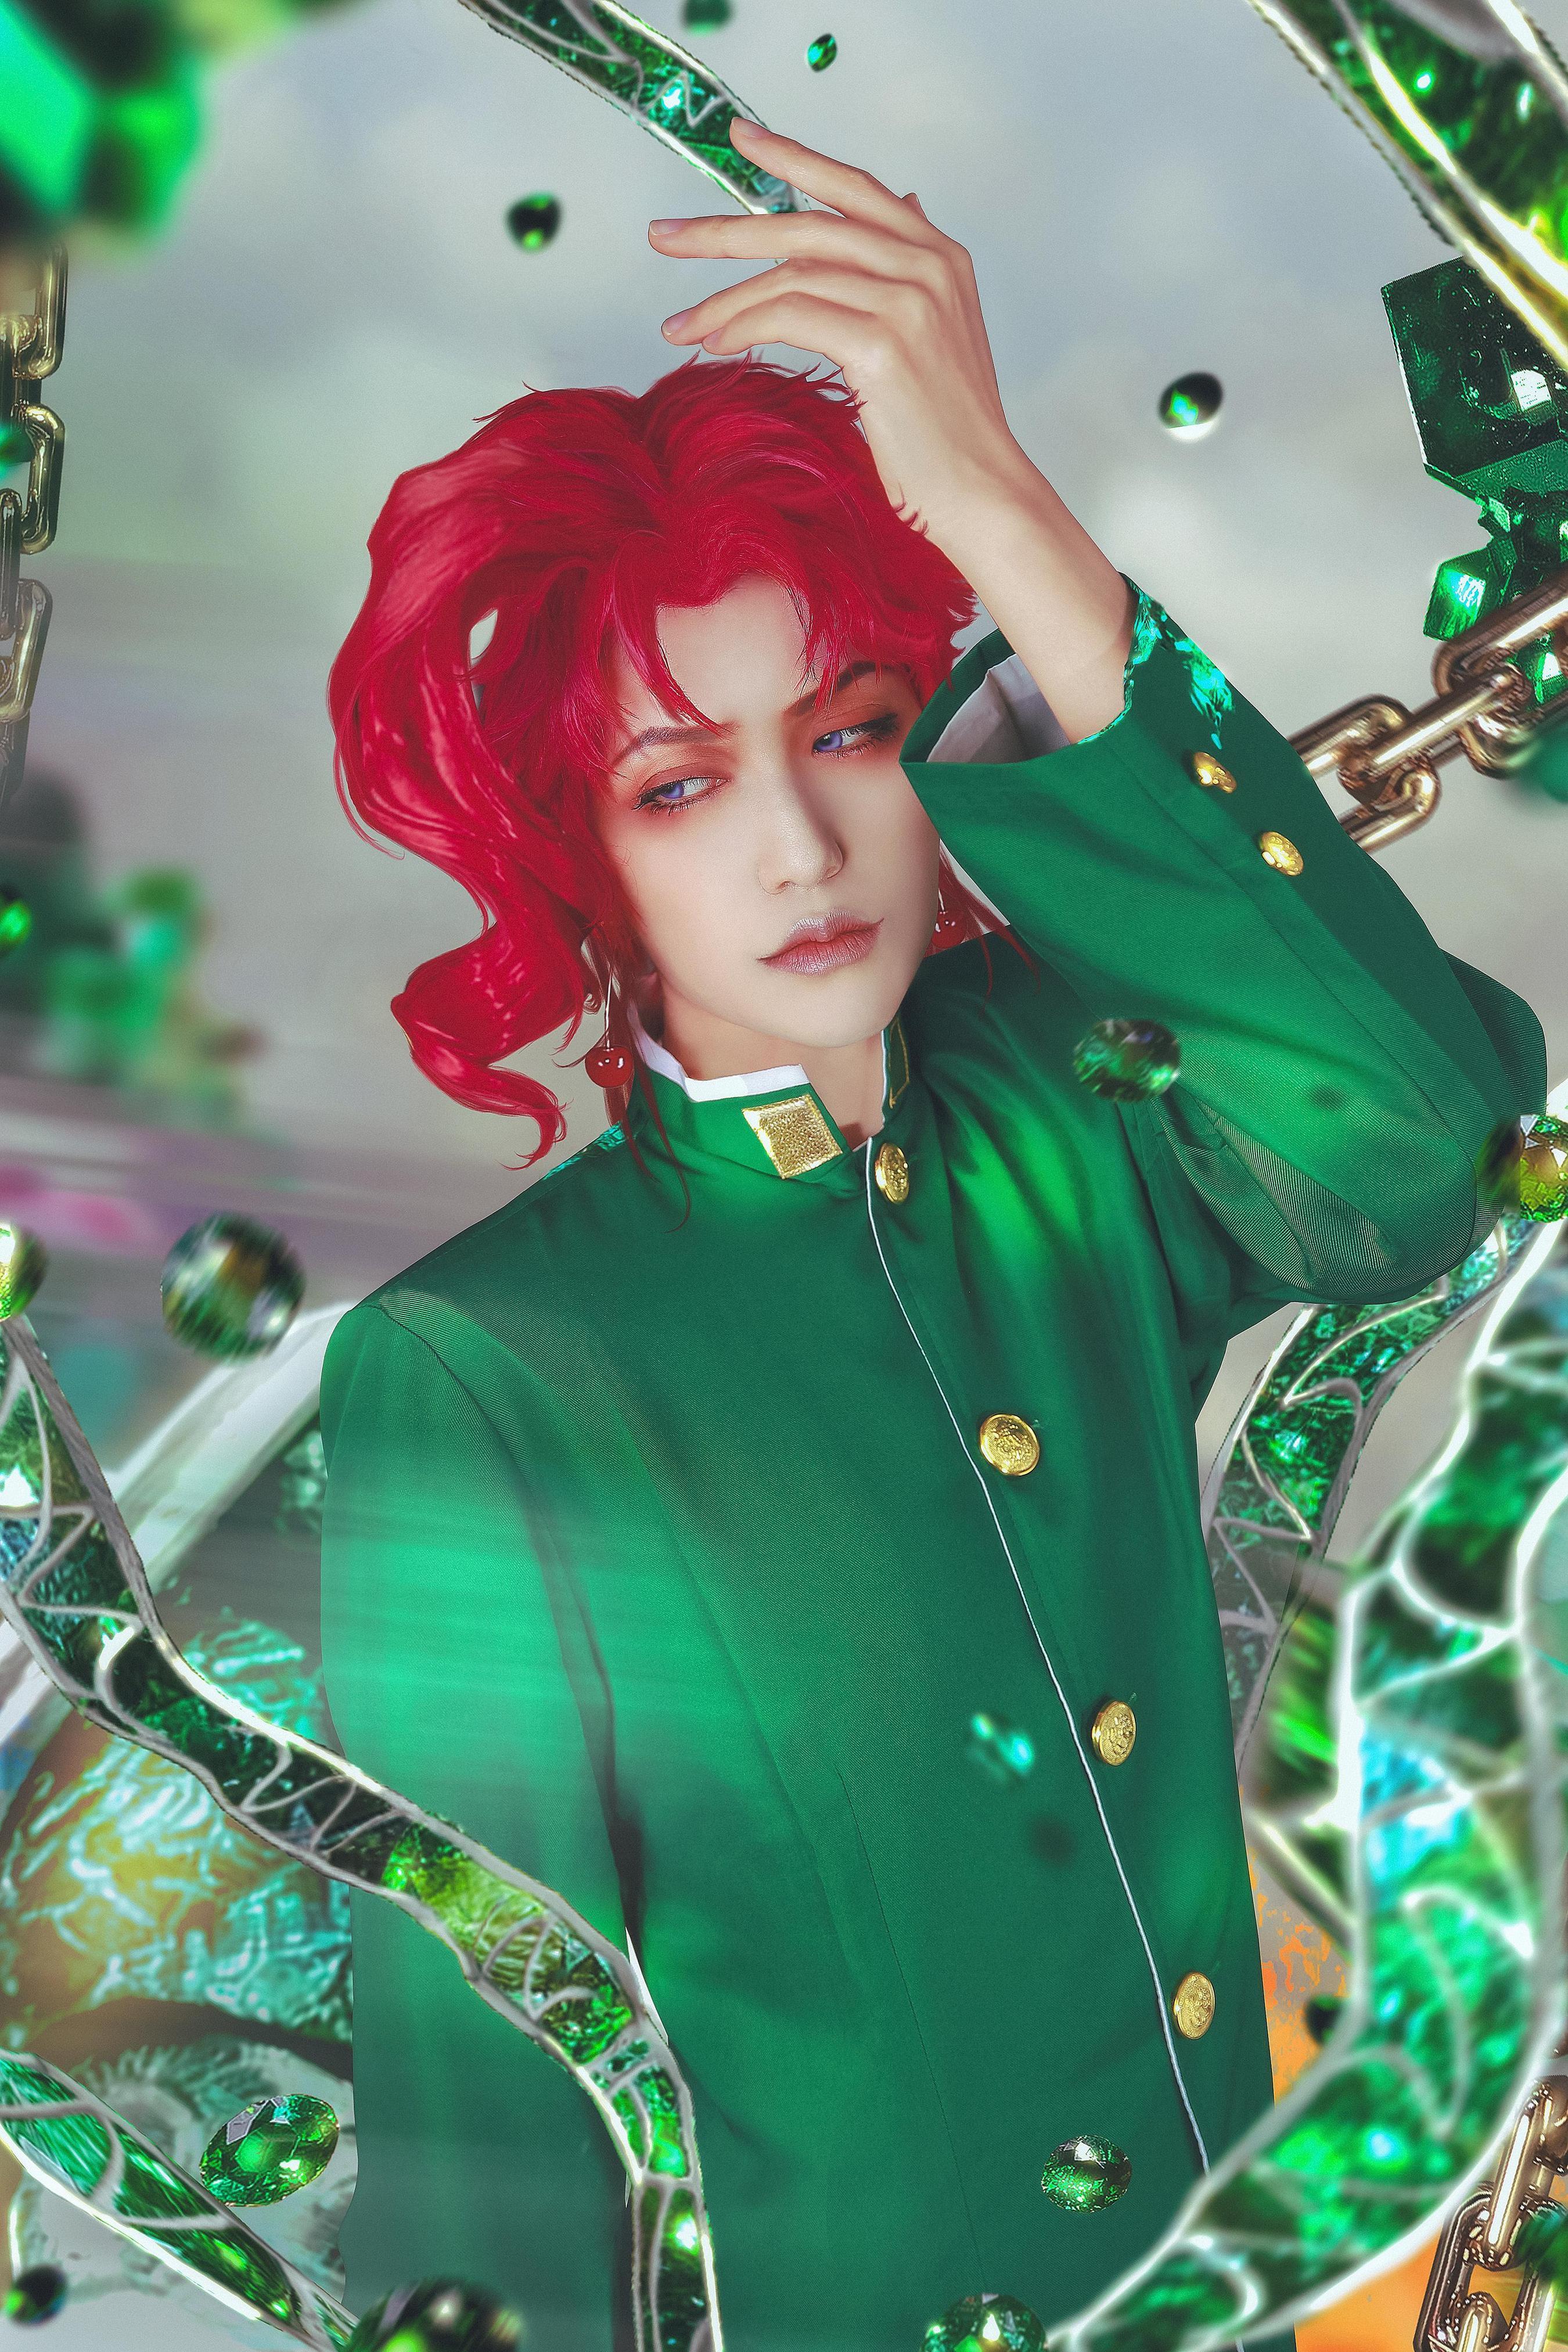 《JOJO的奇妙冒险》花京院典明cosplay【CN:一矢_Ichiya】-第1张